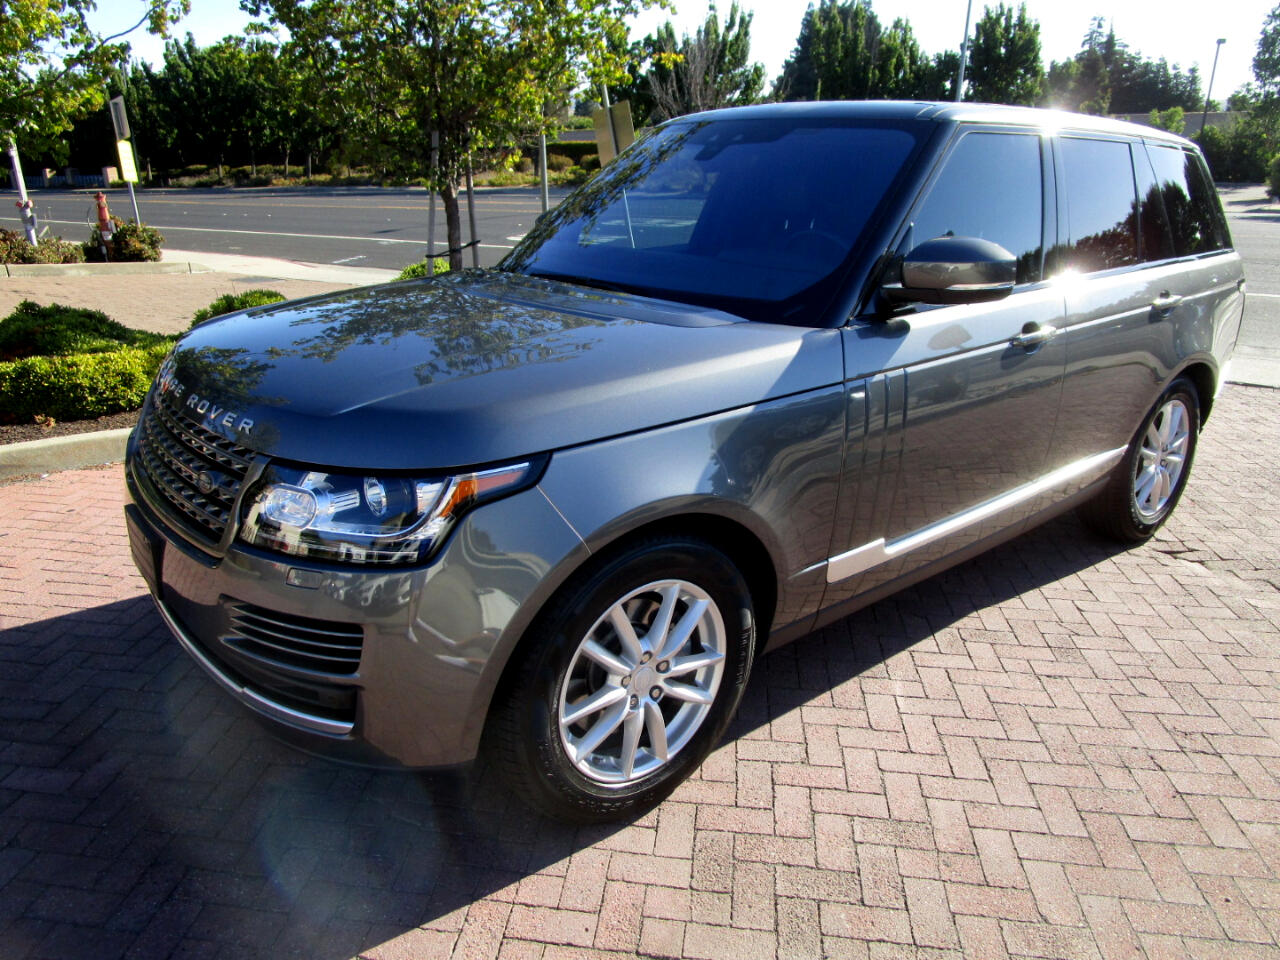 2017 Land Rover Range Rover 3.0 TD6 DIESEL**HEAT SEATS*MERID SOUND*PANO ROOF**